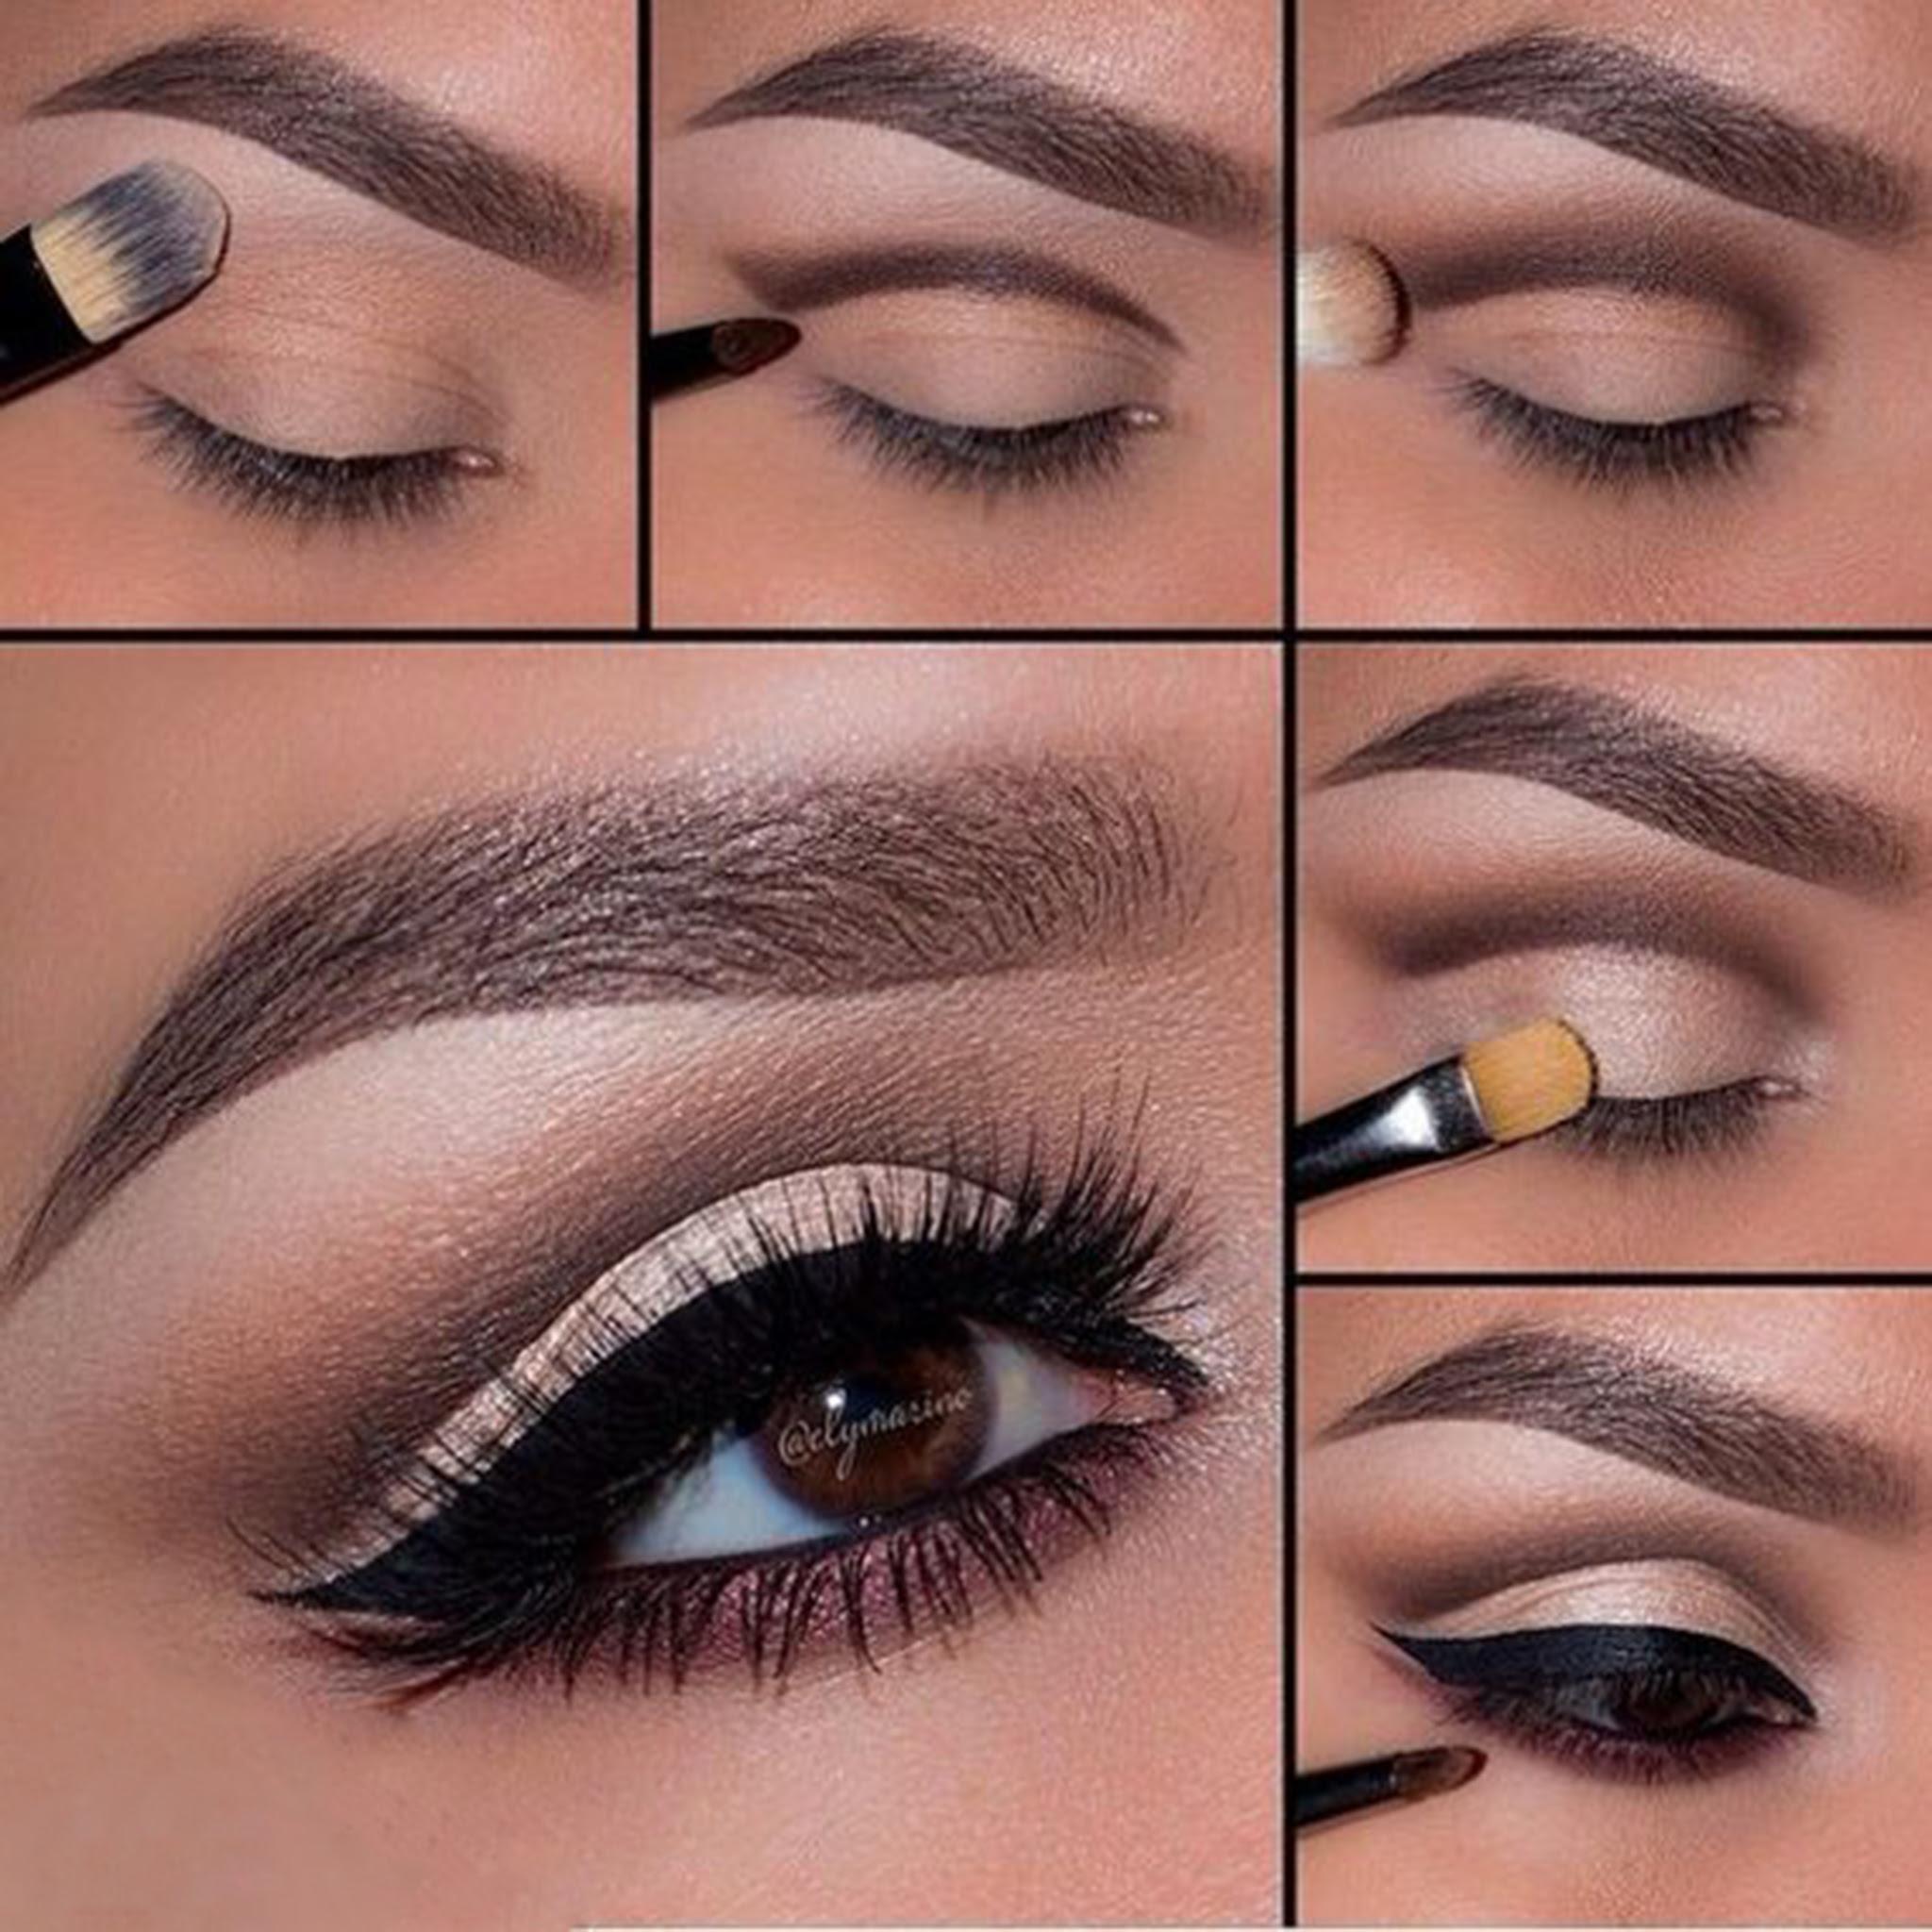 5 Step By Step Smokey Eye Makeup Tutorials For Beginners ...